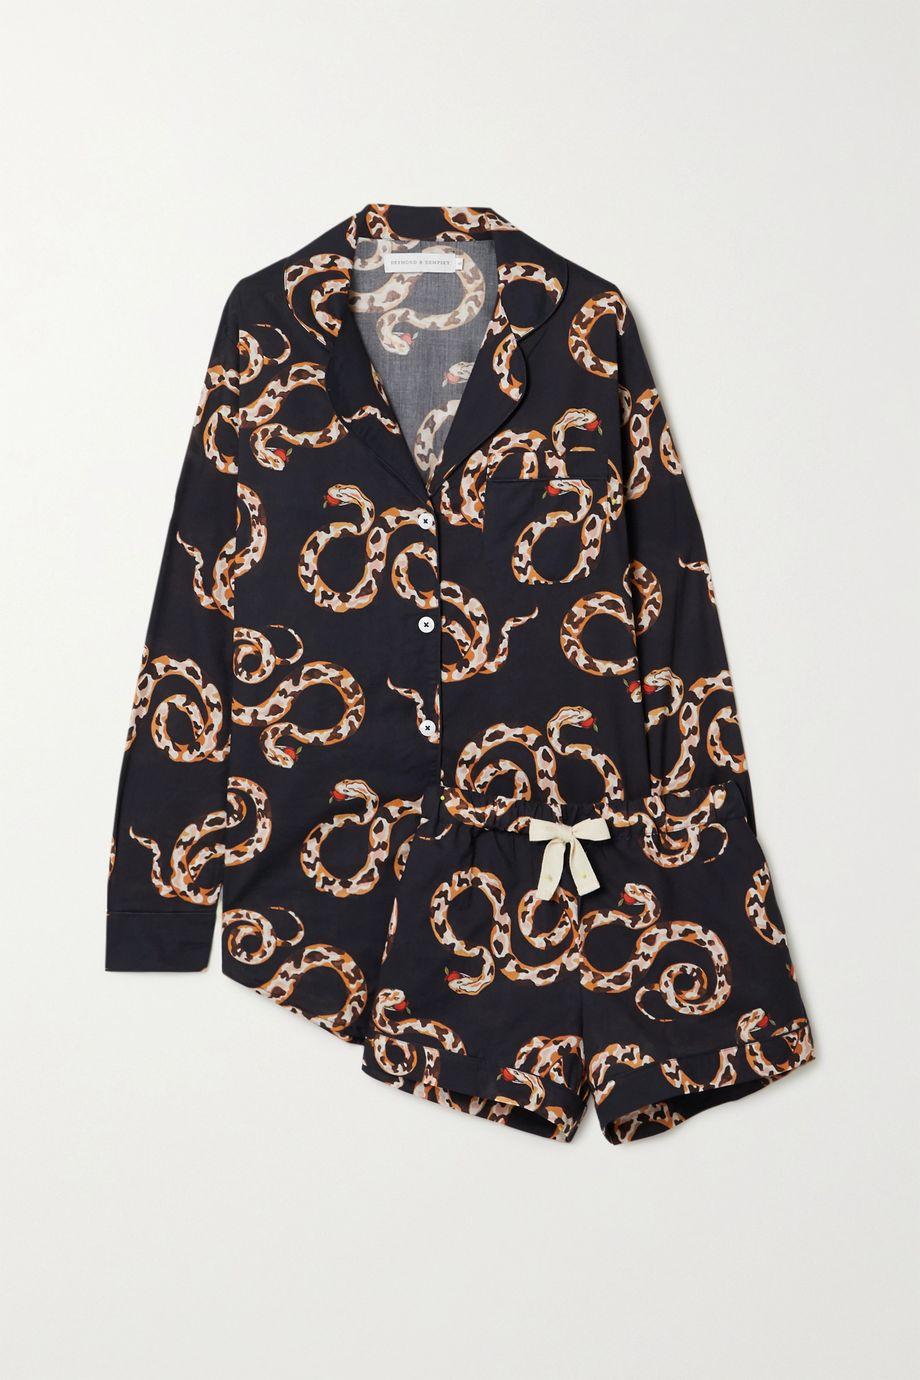 Desmond & Dempsey India printed organic cotton pajama set